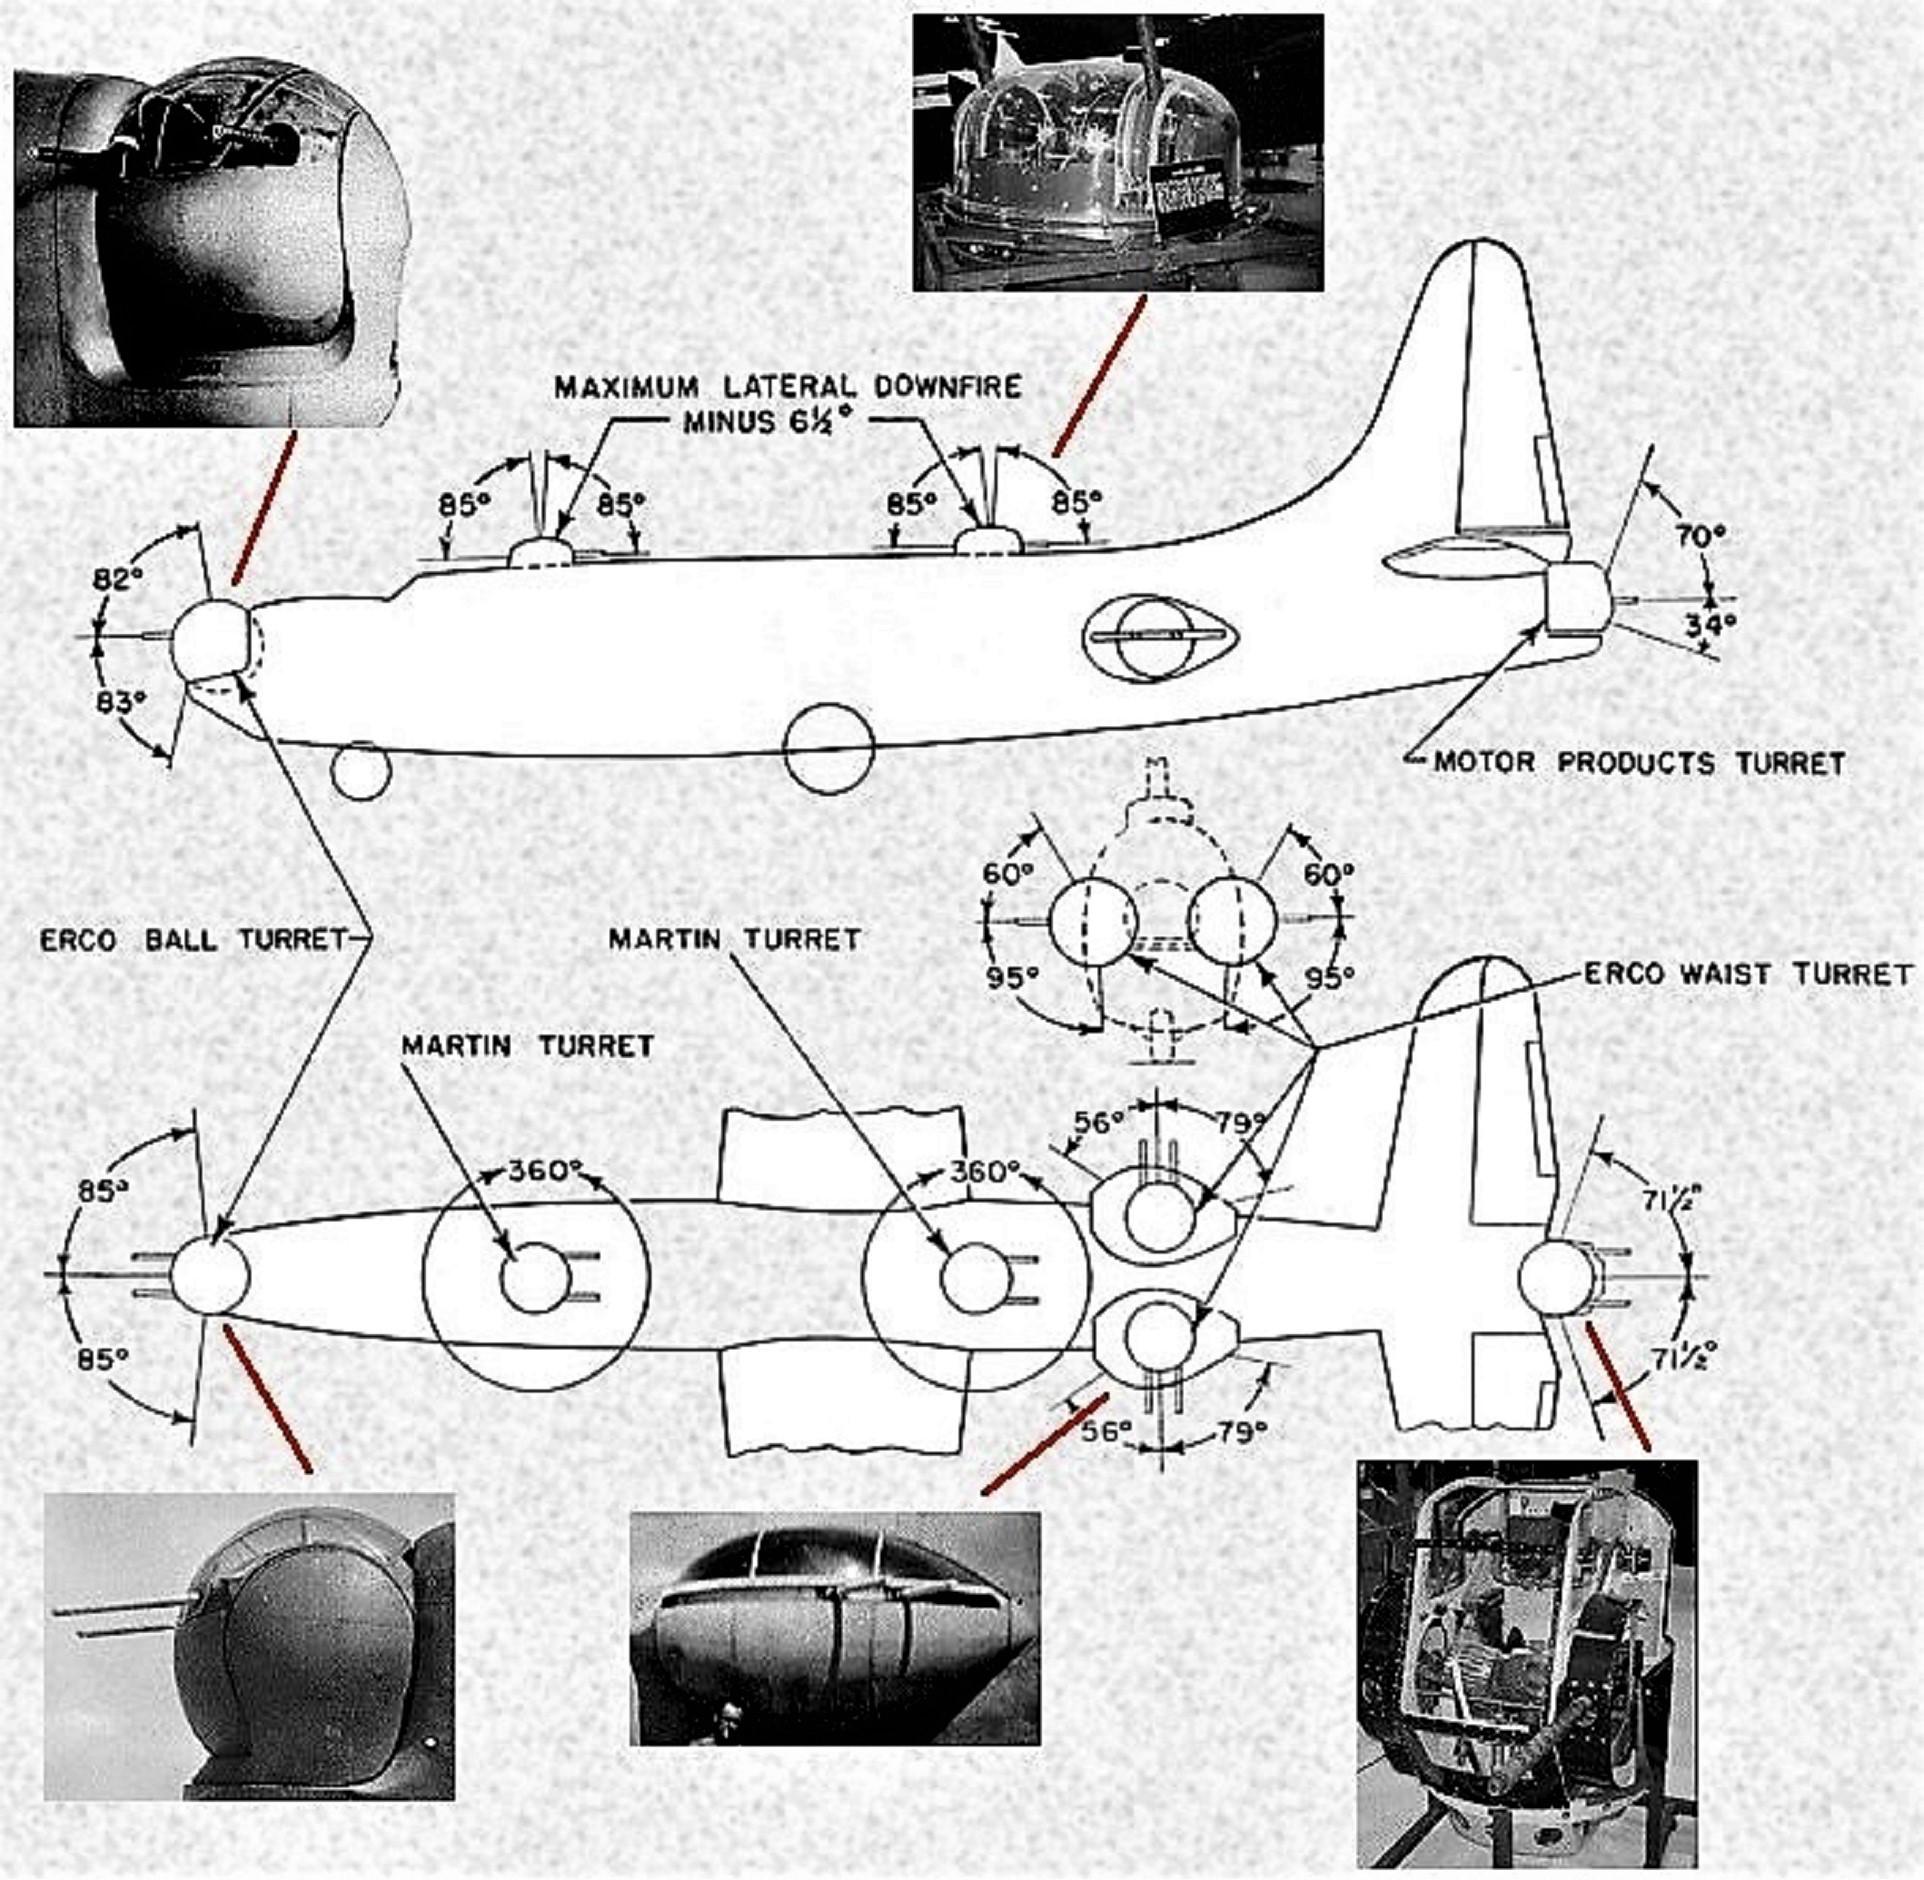 [Les anciens avions de l'aéro] Consolidated PB4Y-2 Privateer - Page 2 Caract10